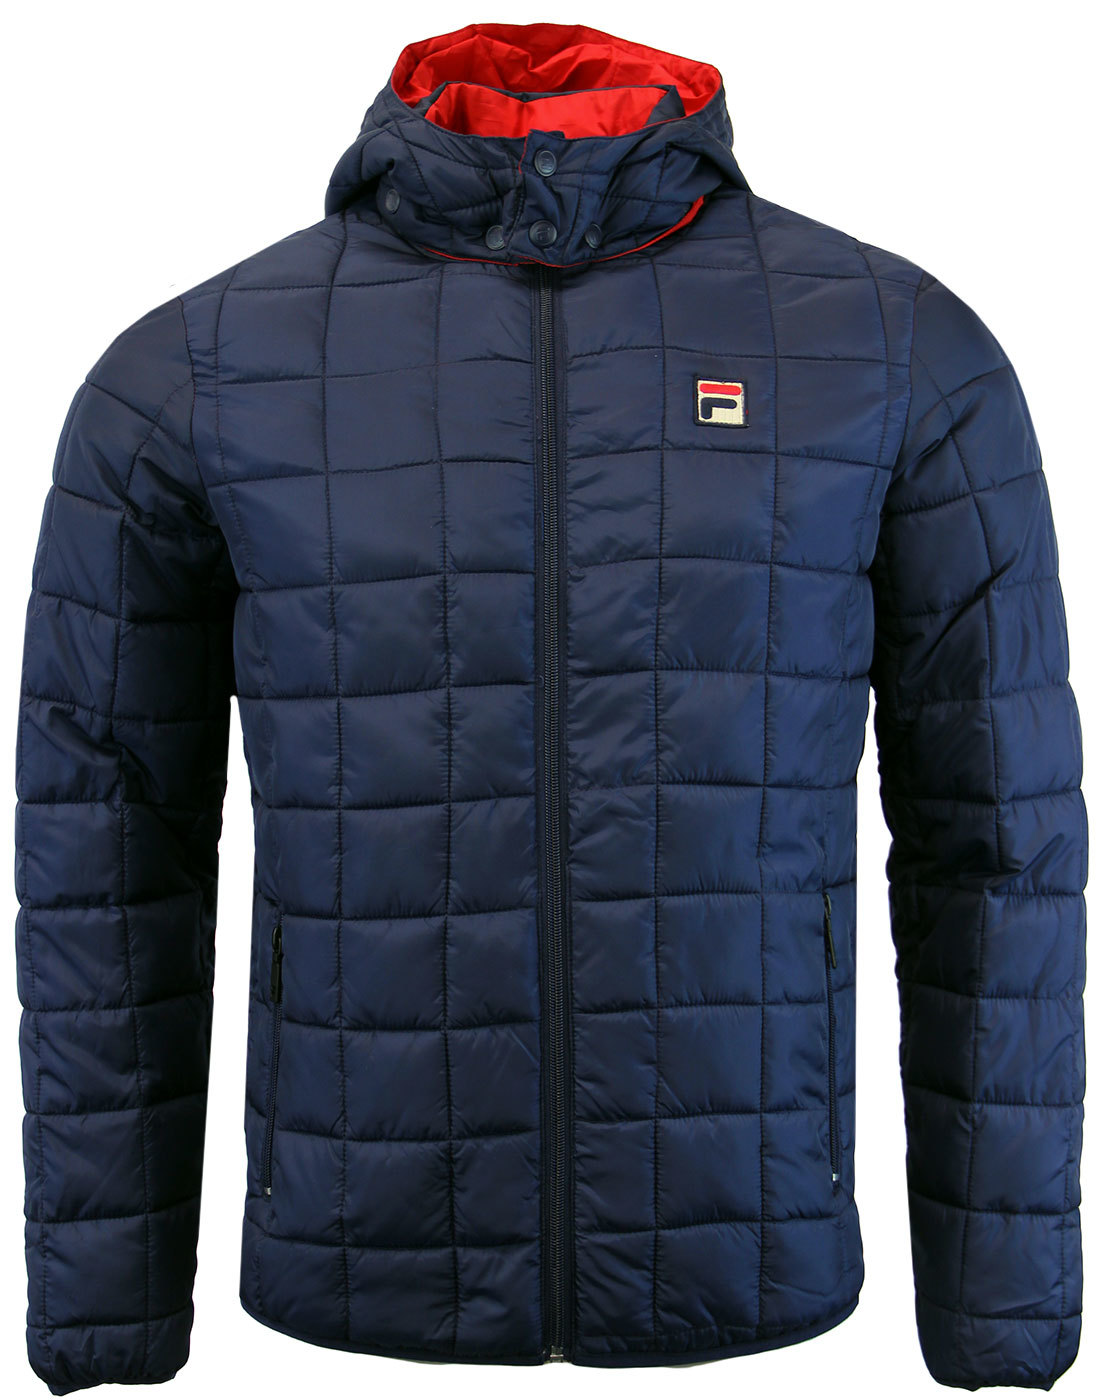 f7548f19058b FILA VINTAGE Passo Retro 70s Hooded Puffa Ski Jacket in Peacoat